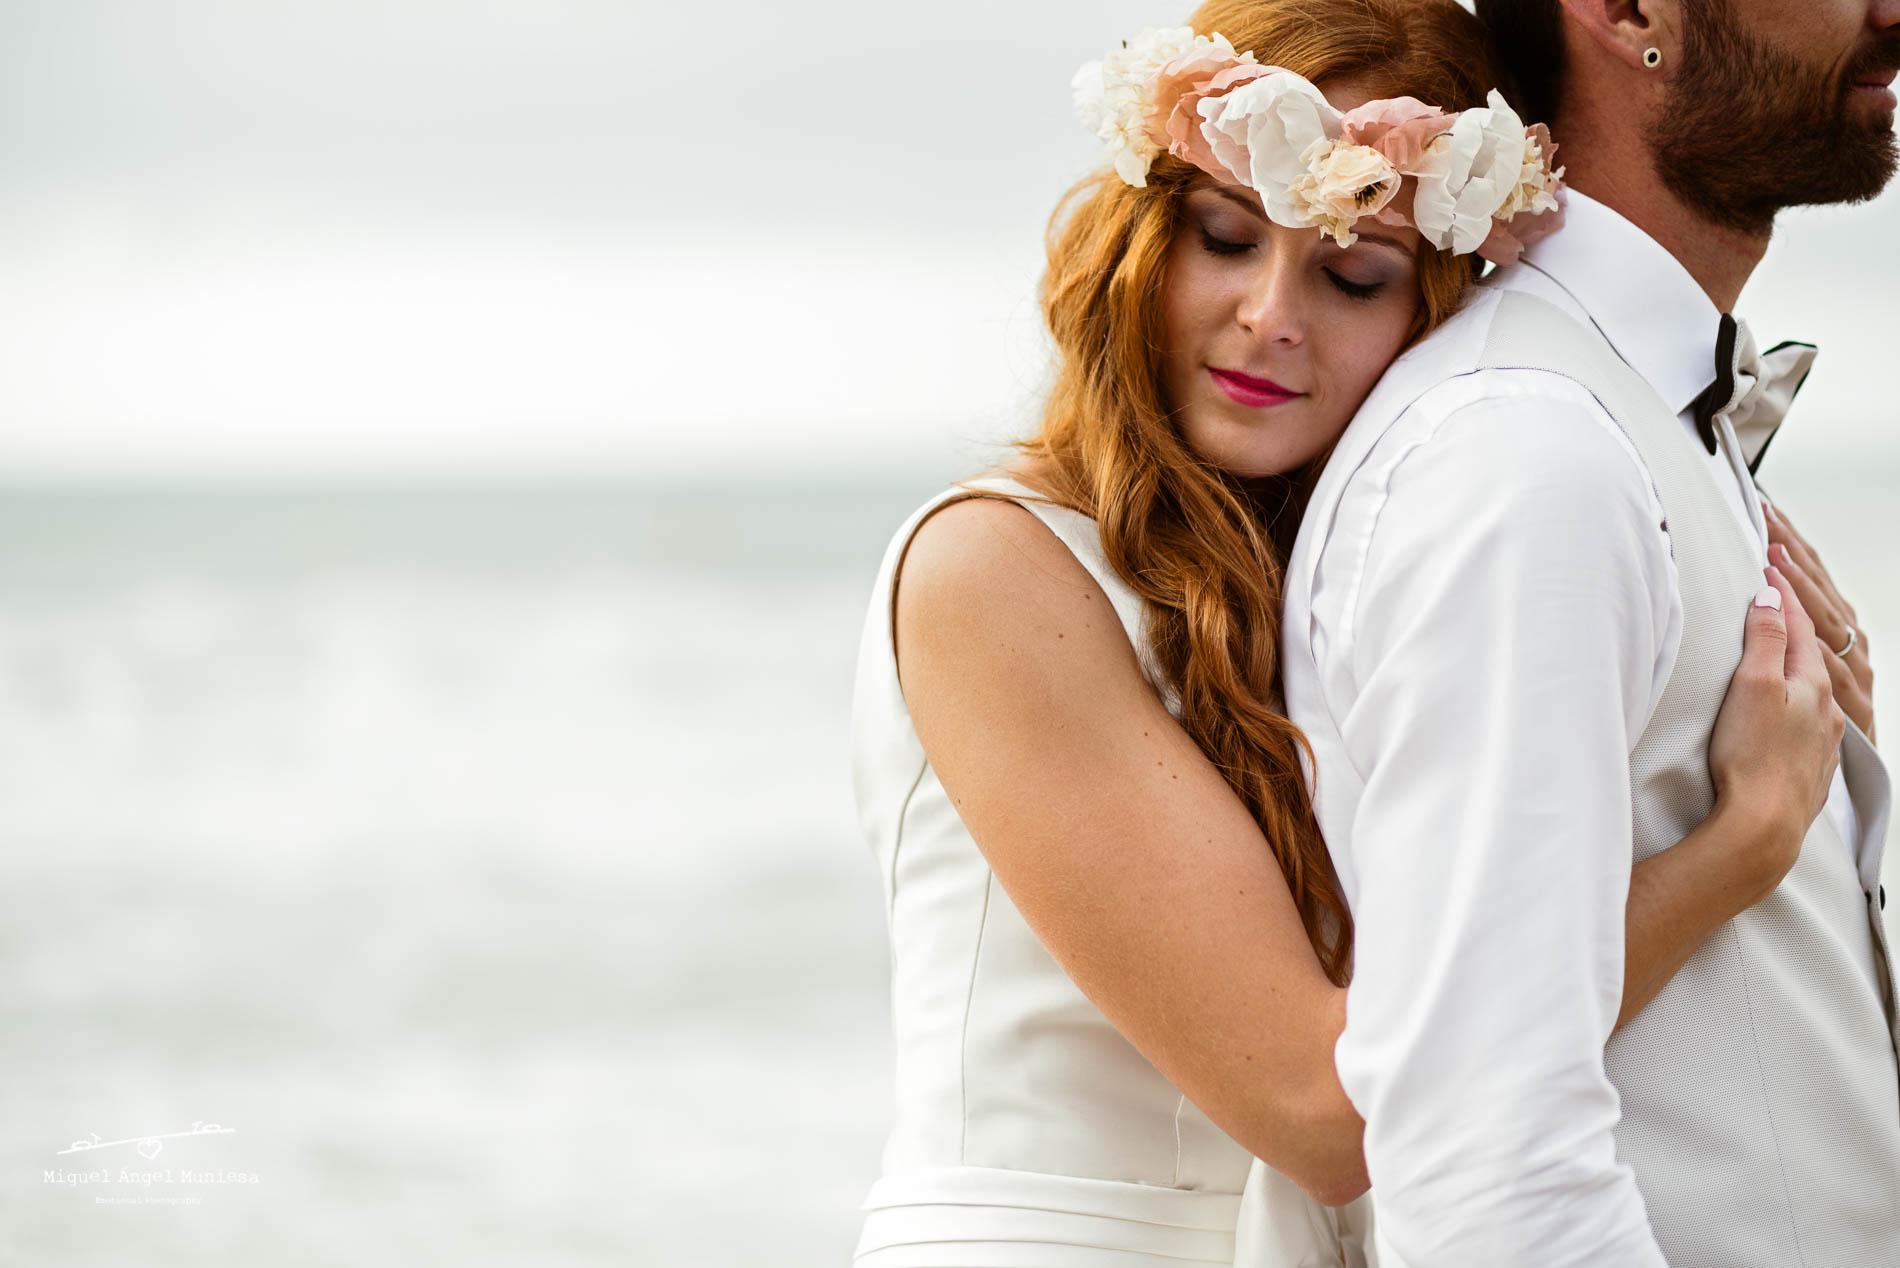 boda, fotografia de boda, boda zaragoza, fotografia, wedding, wedding photography, miguel angel muniesa, fotografo boda Zaragoza, fotografo boda, destination wedding_ 0004